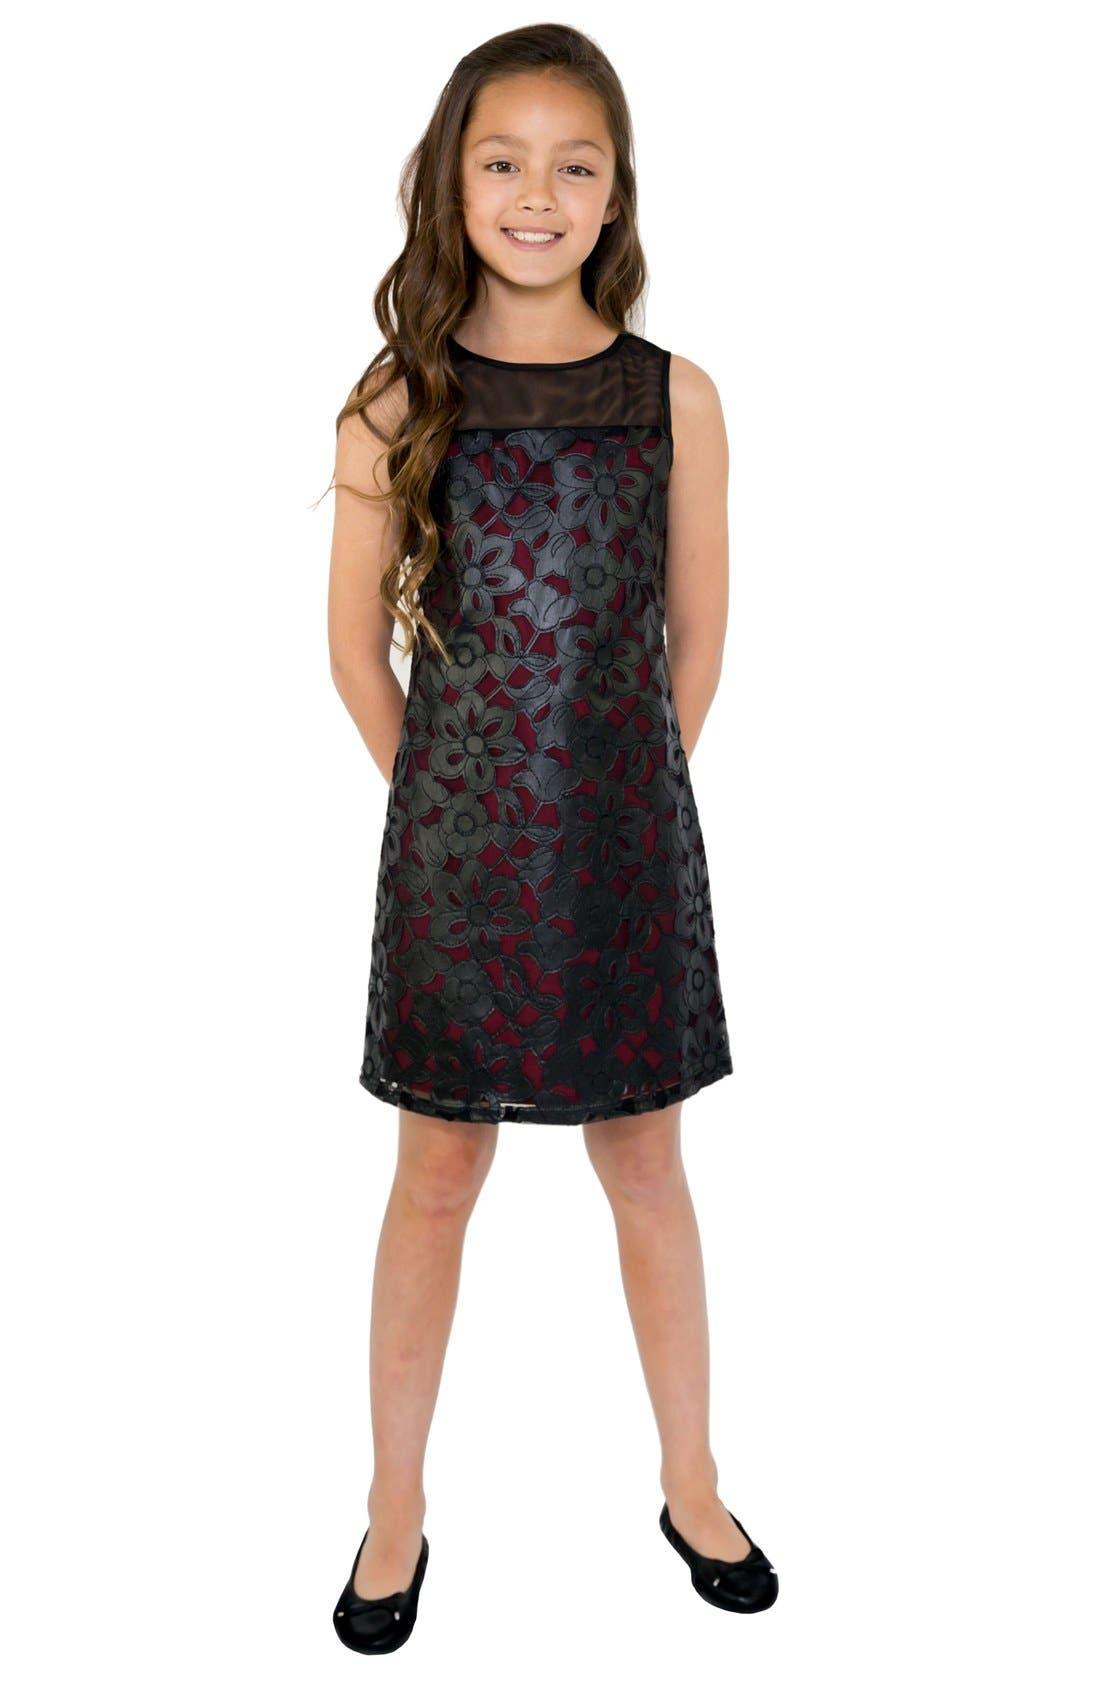 Main Image - BLUSH by Us Angels Faux Leather Sheath Dress (Big Girls)